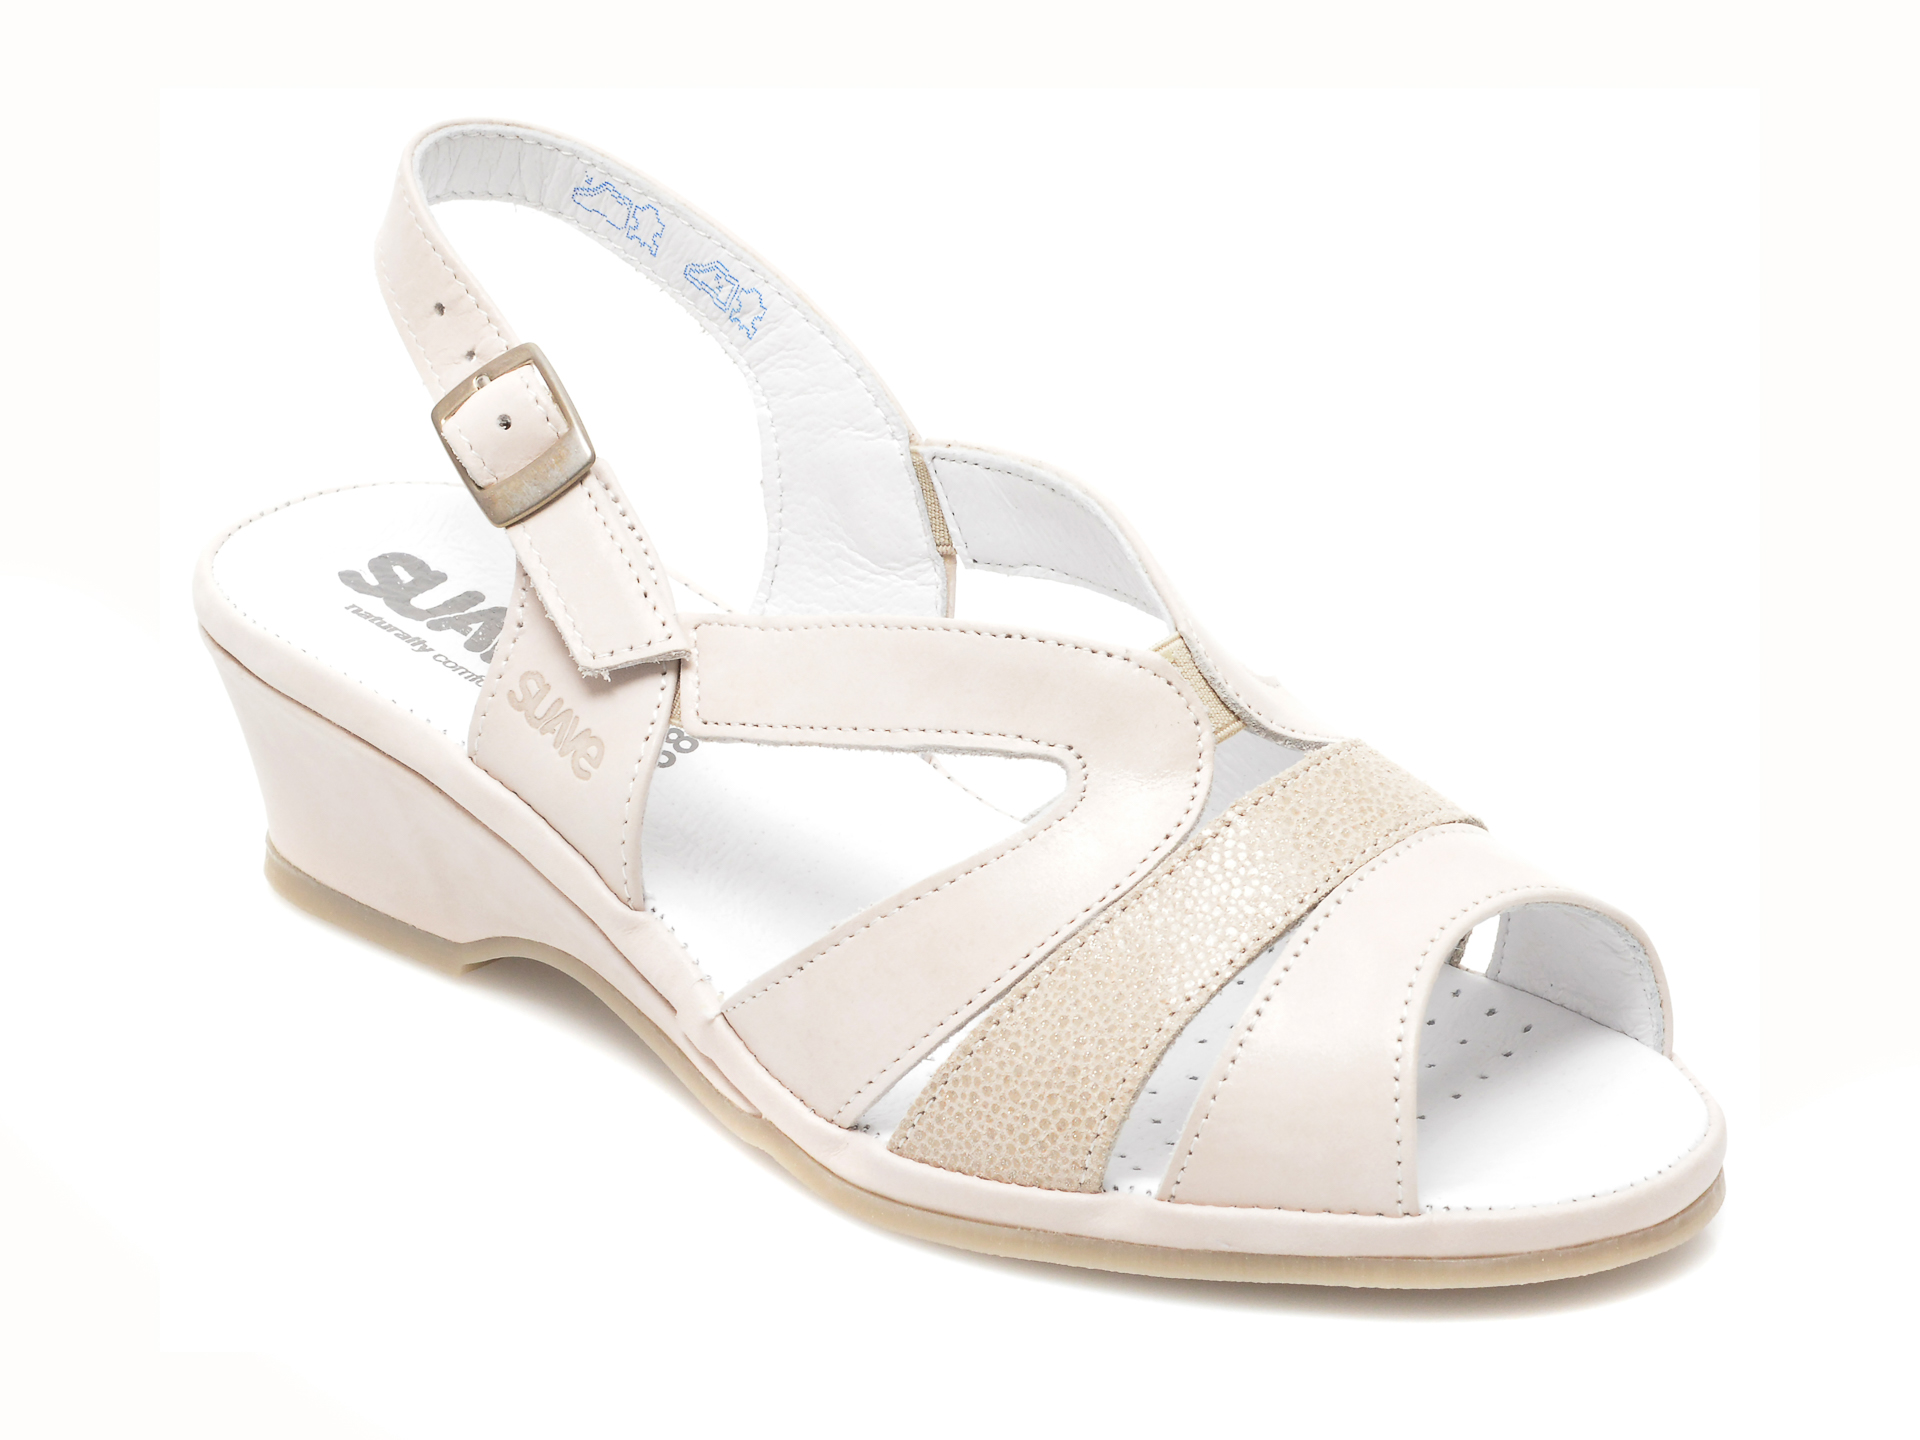 Sandale SUAVE albe, 259, din piele naturala imagine 2021 otter.ro